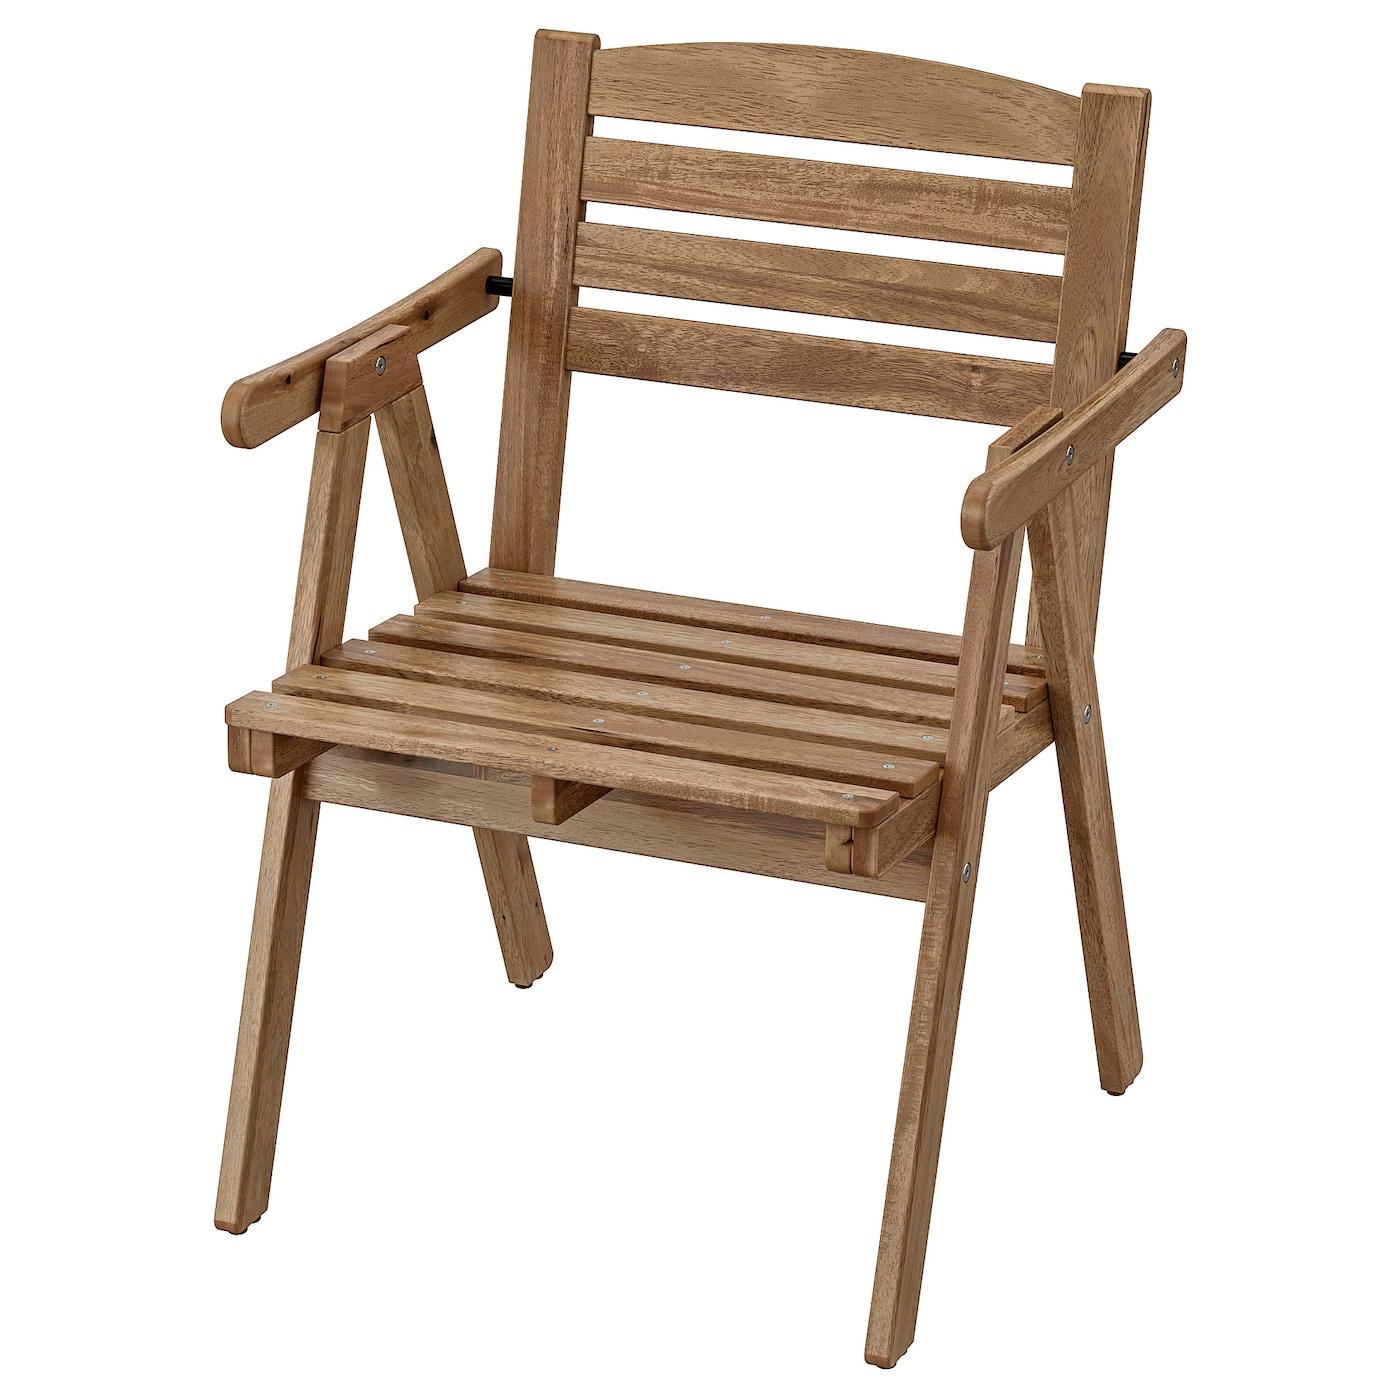 Garden Furniture – Garden Furnitures – Rattan Furniture – Ikea Inside Manchester Solid Wood Garden Benches (View 23 of 25)